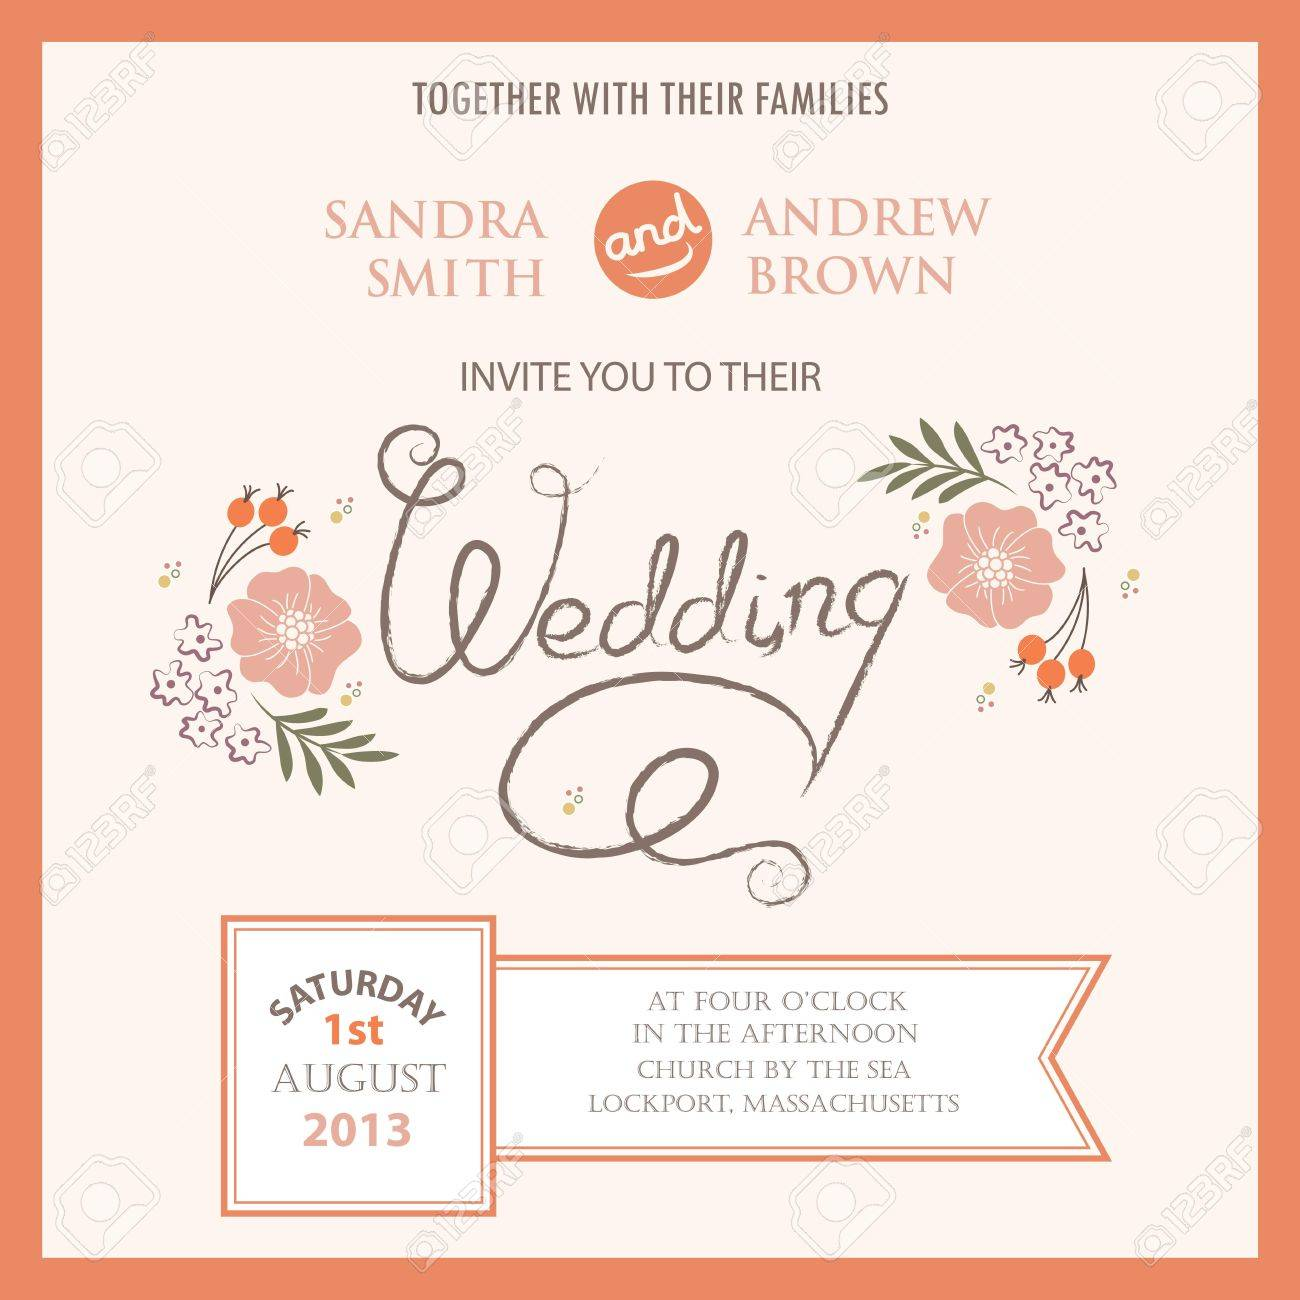 Wedding Invitation Card Royalty Free Cliparts, Vectors, And Stock ...